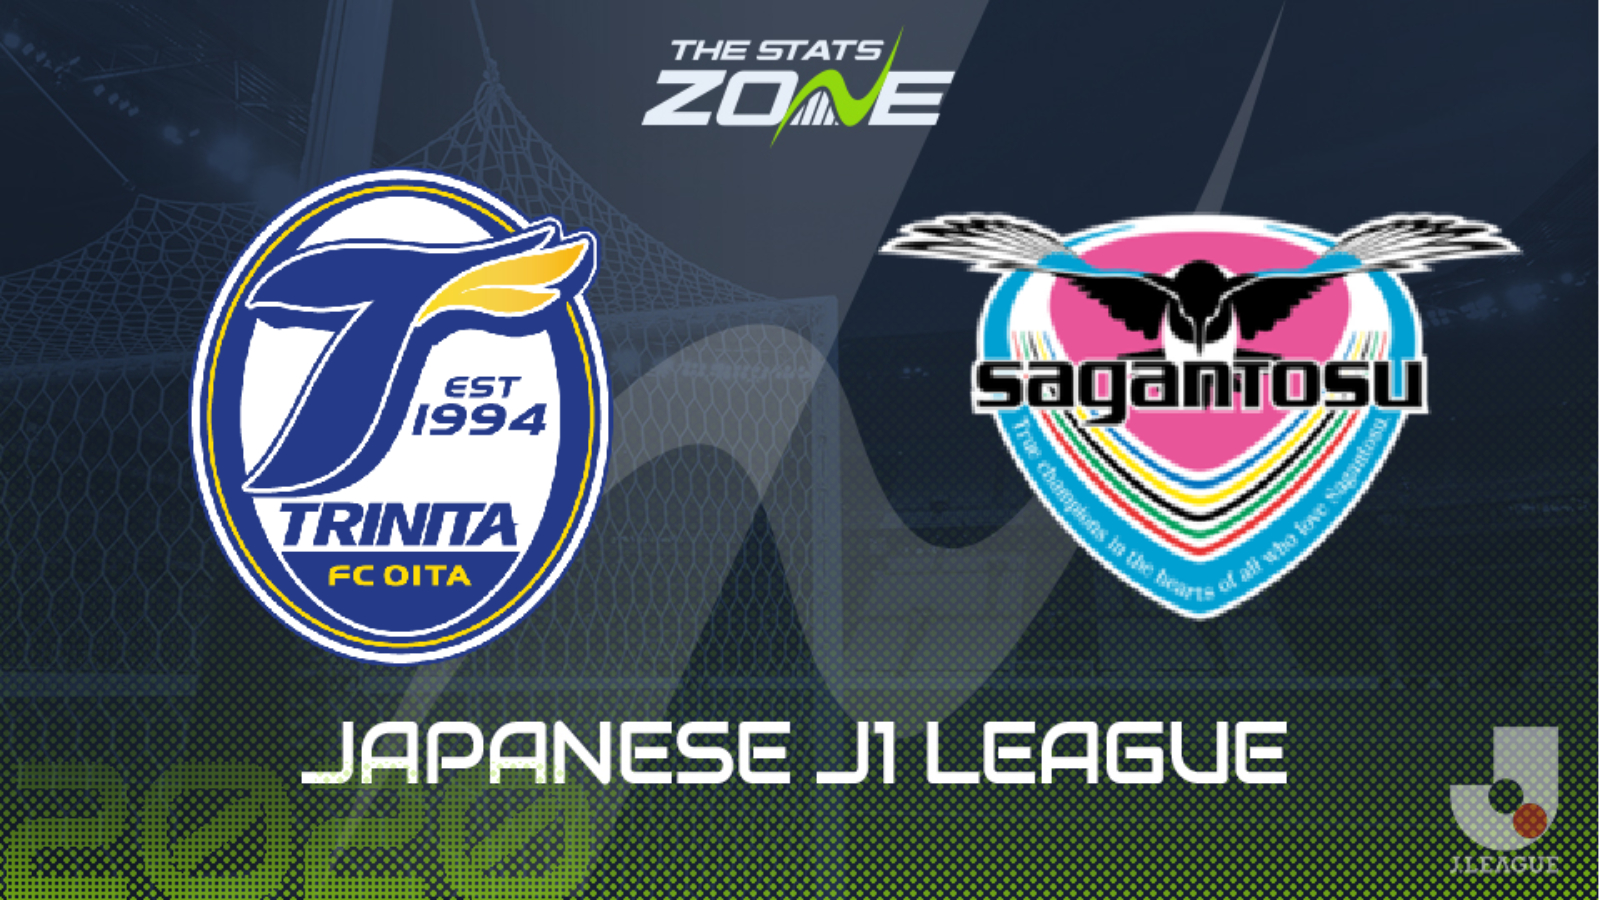 2019 20 Japanese J1 League Oita Trinita Vs Sagan Tosu Preview Prediction The Stats Zone